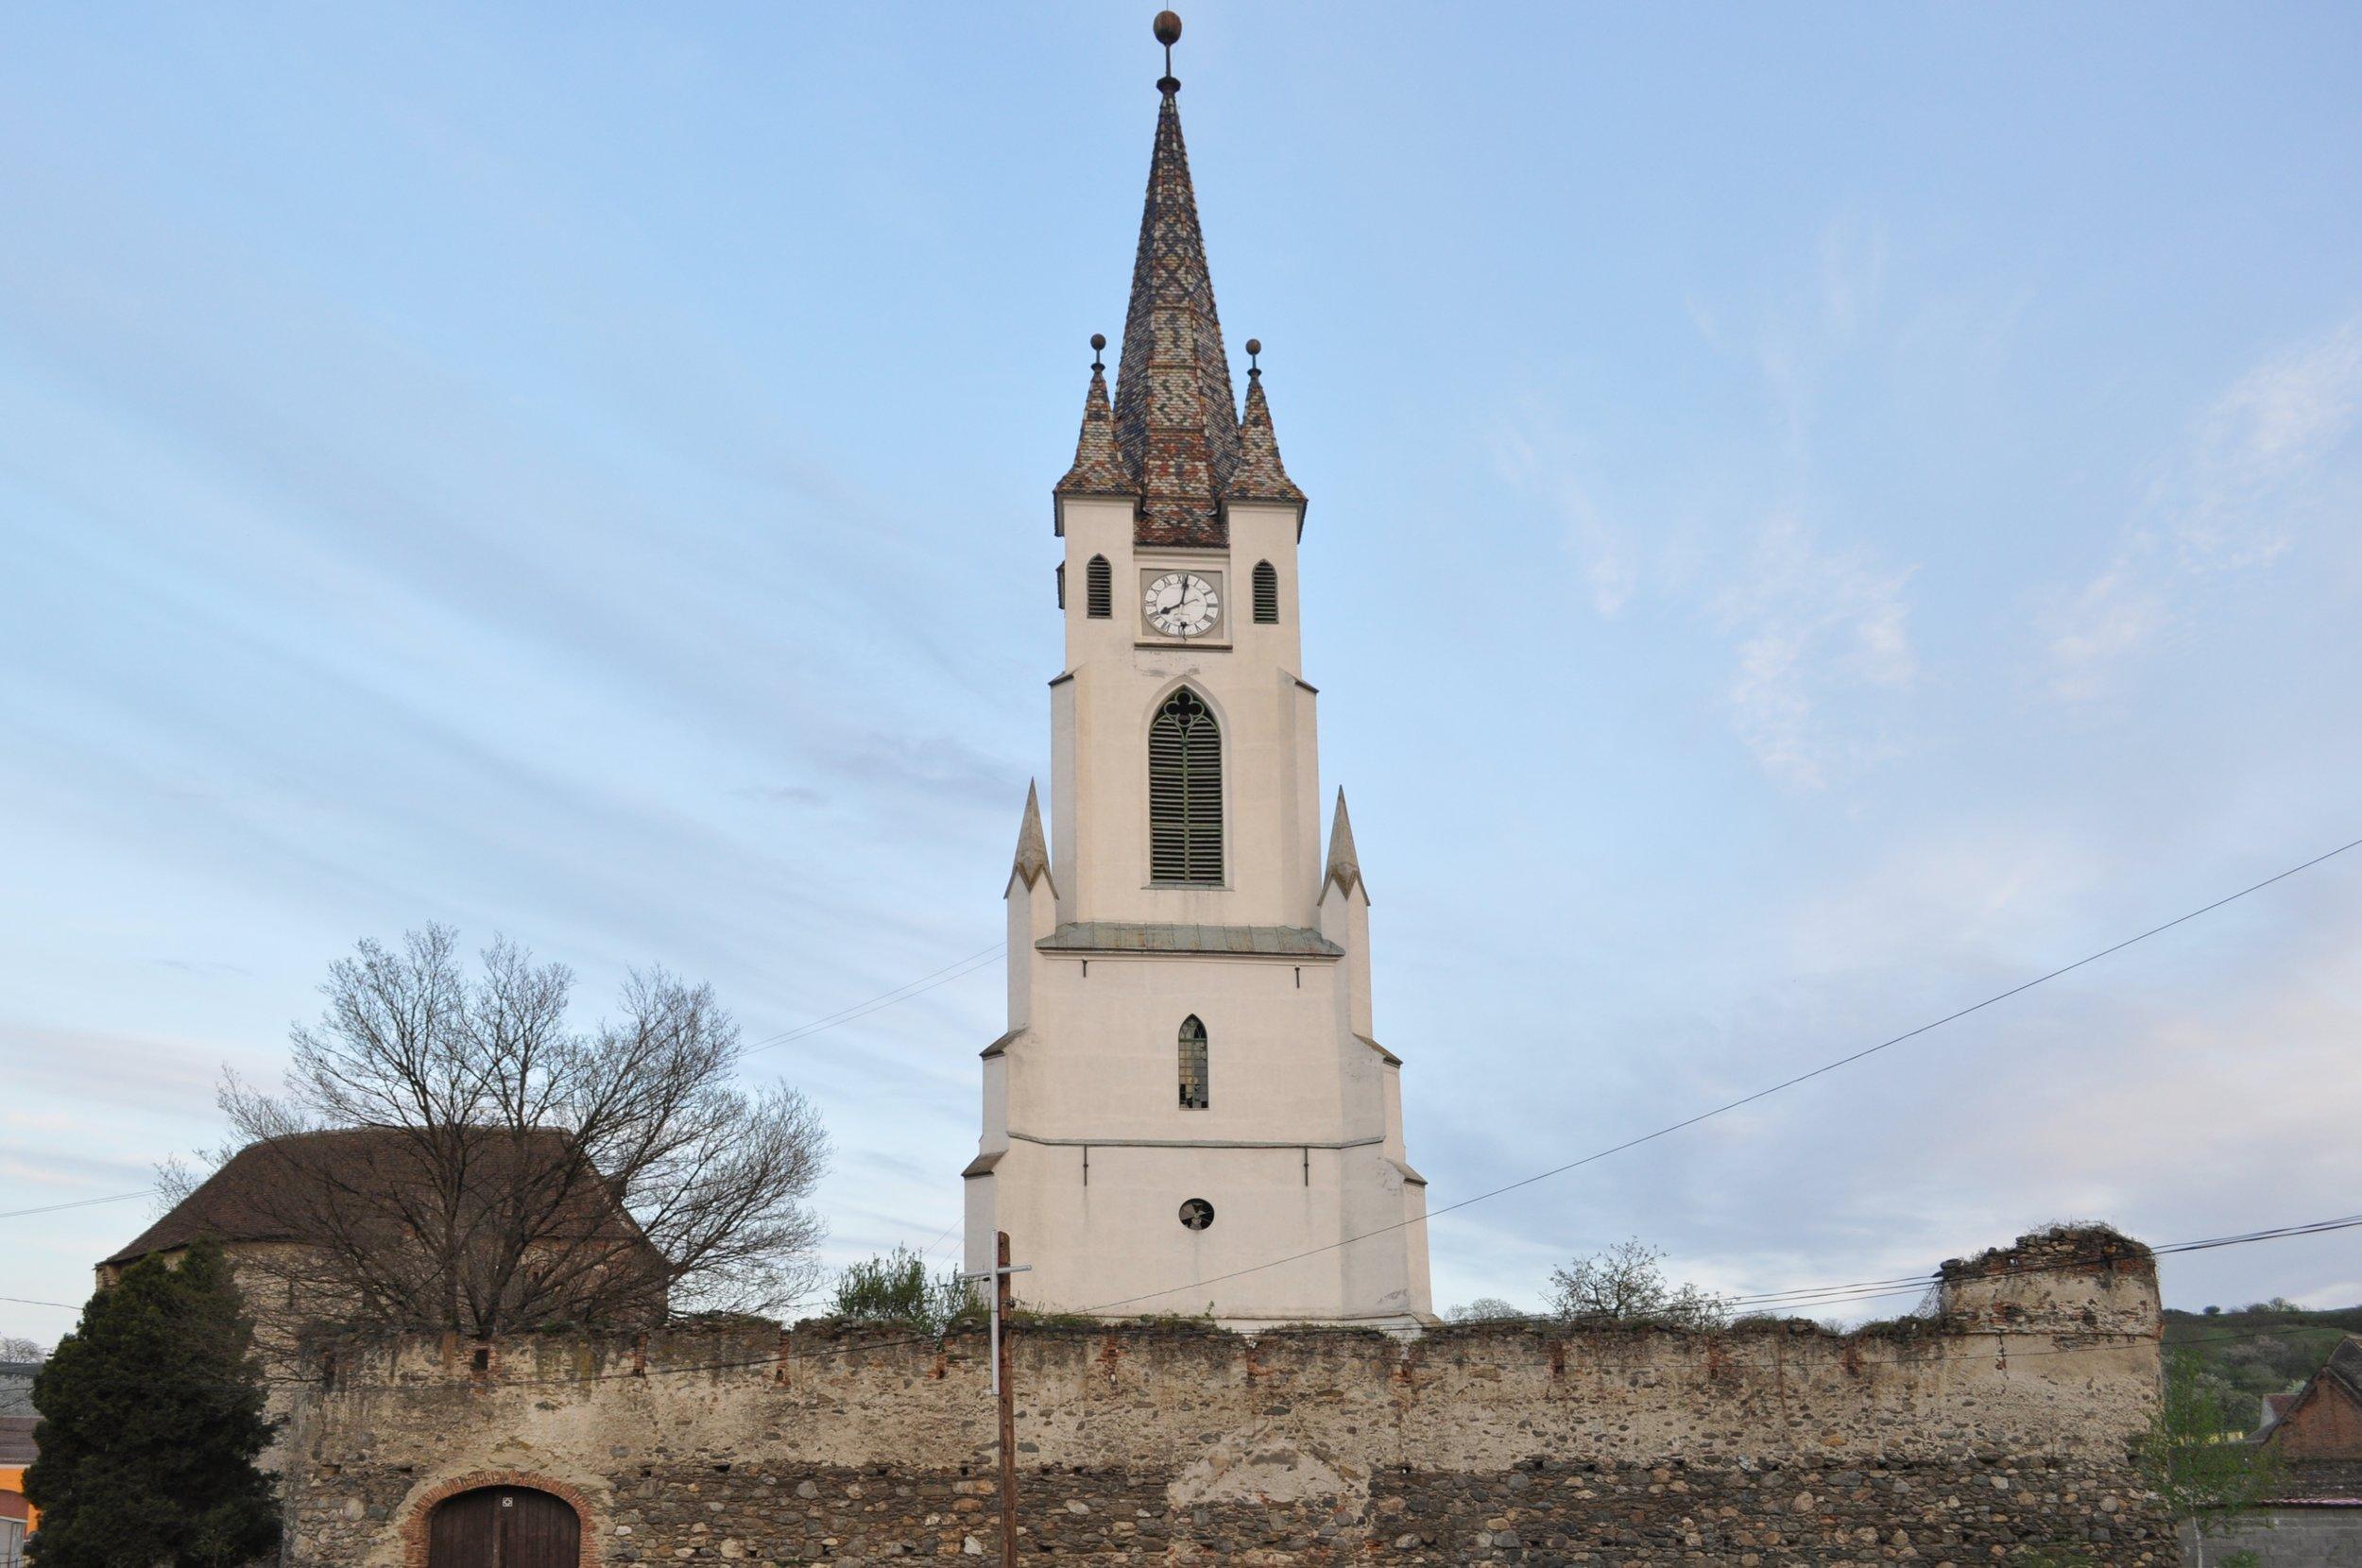 📷 Țetcu Mircea Rareș (Wikimedia Commons)